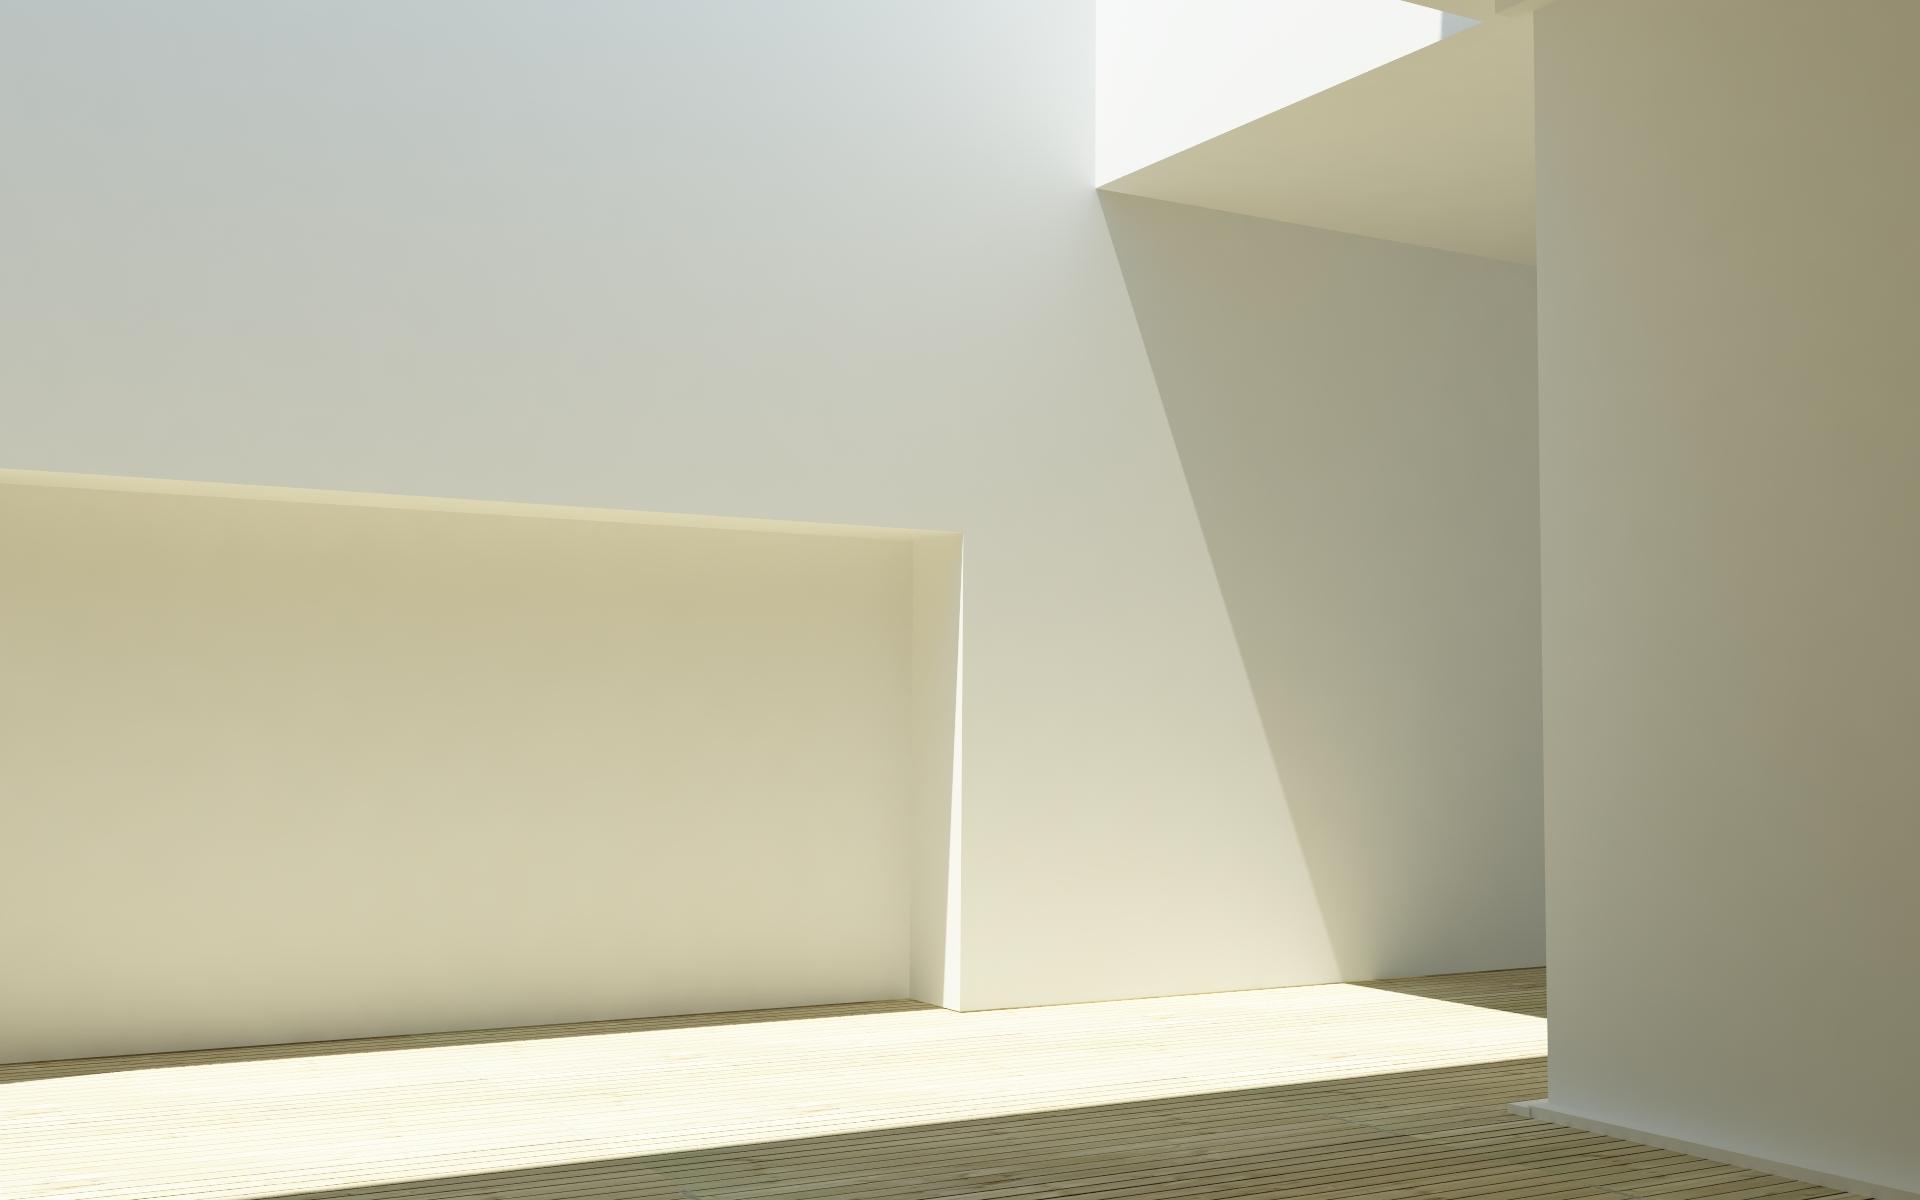 1920x1200 Minimal Home Design desktop PC and Mac wallpaper 1920x1200